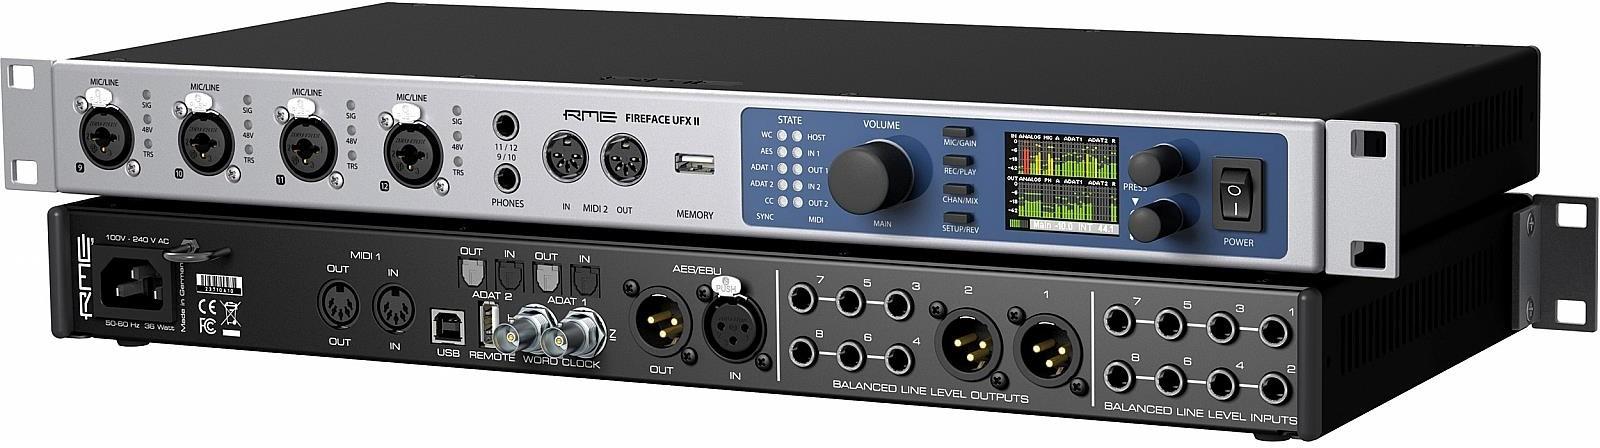 RME FIREFACE UFX II + kurs domowe studio nagrań 60160